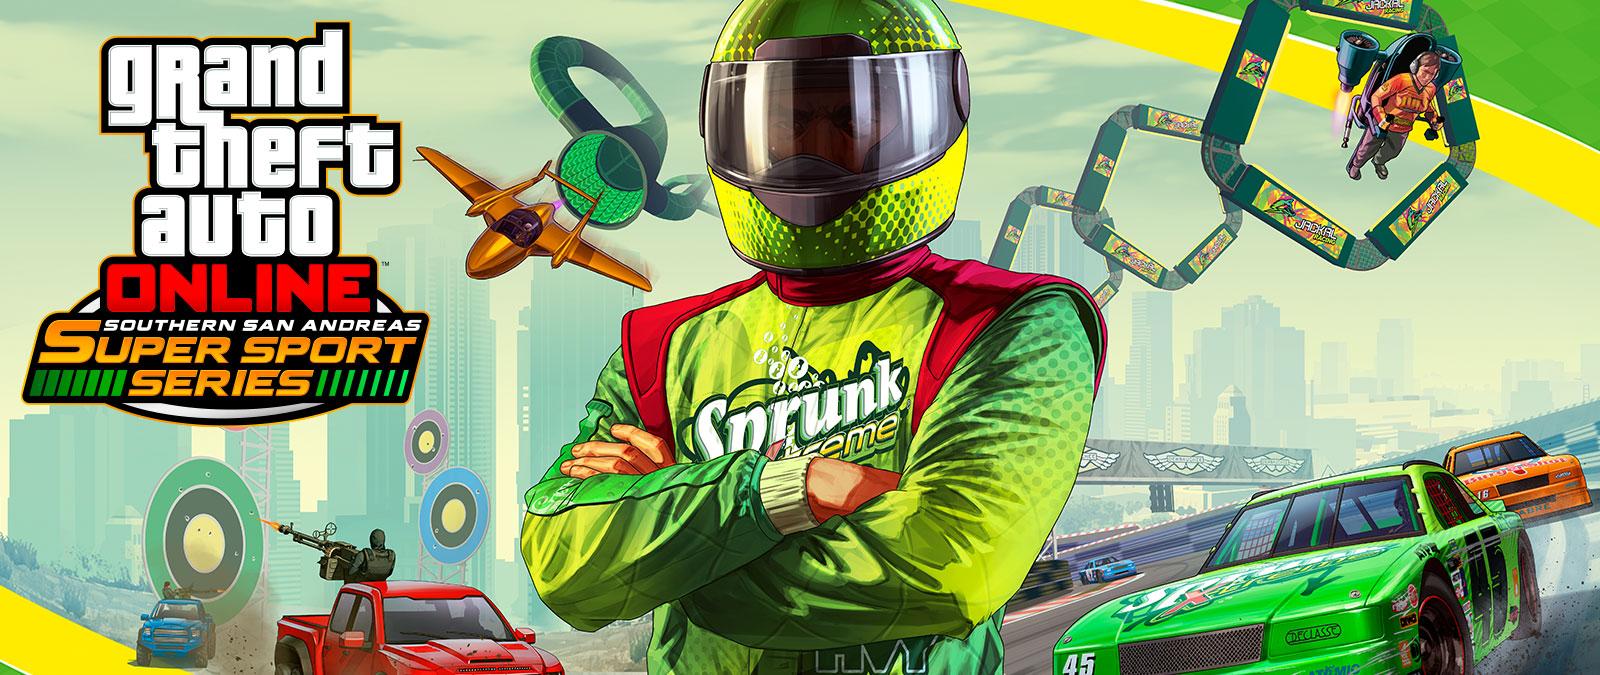 Grand Theft Auto Online Southern San Andreas Super Sports Series,Sprunk Racecar 車手雙臂交叉,站在各種不同競賽前方。